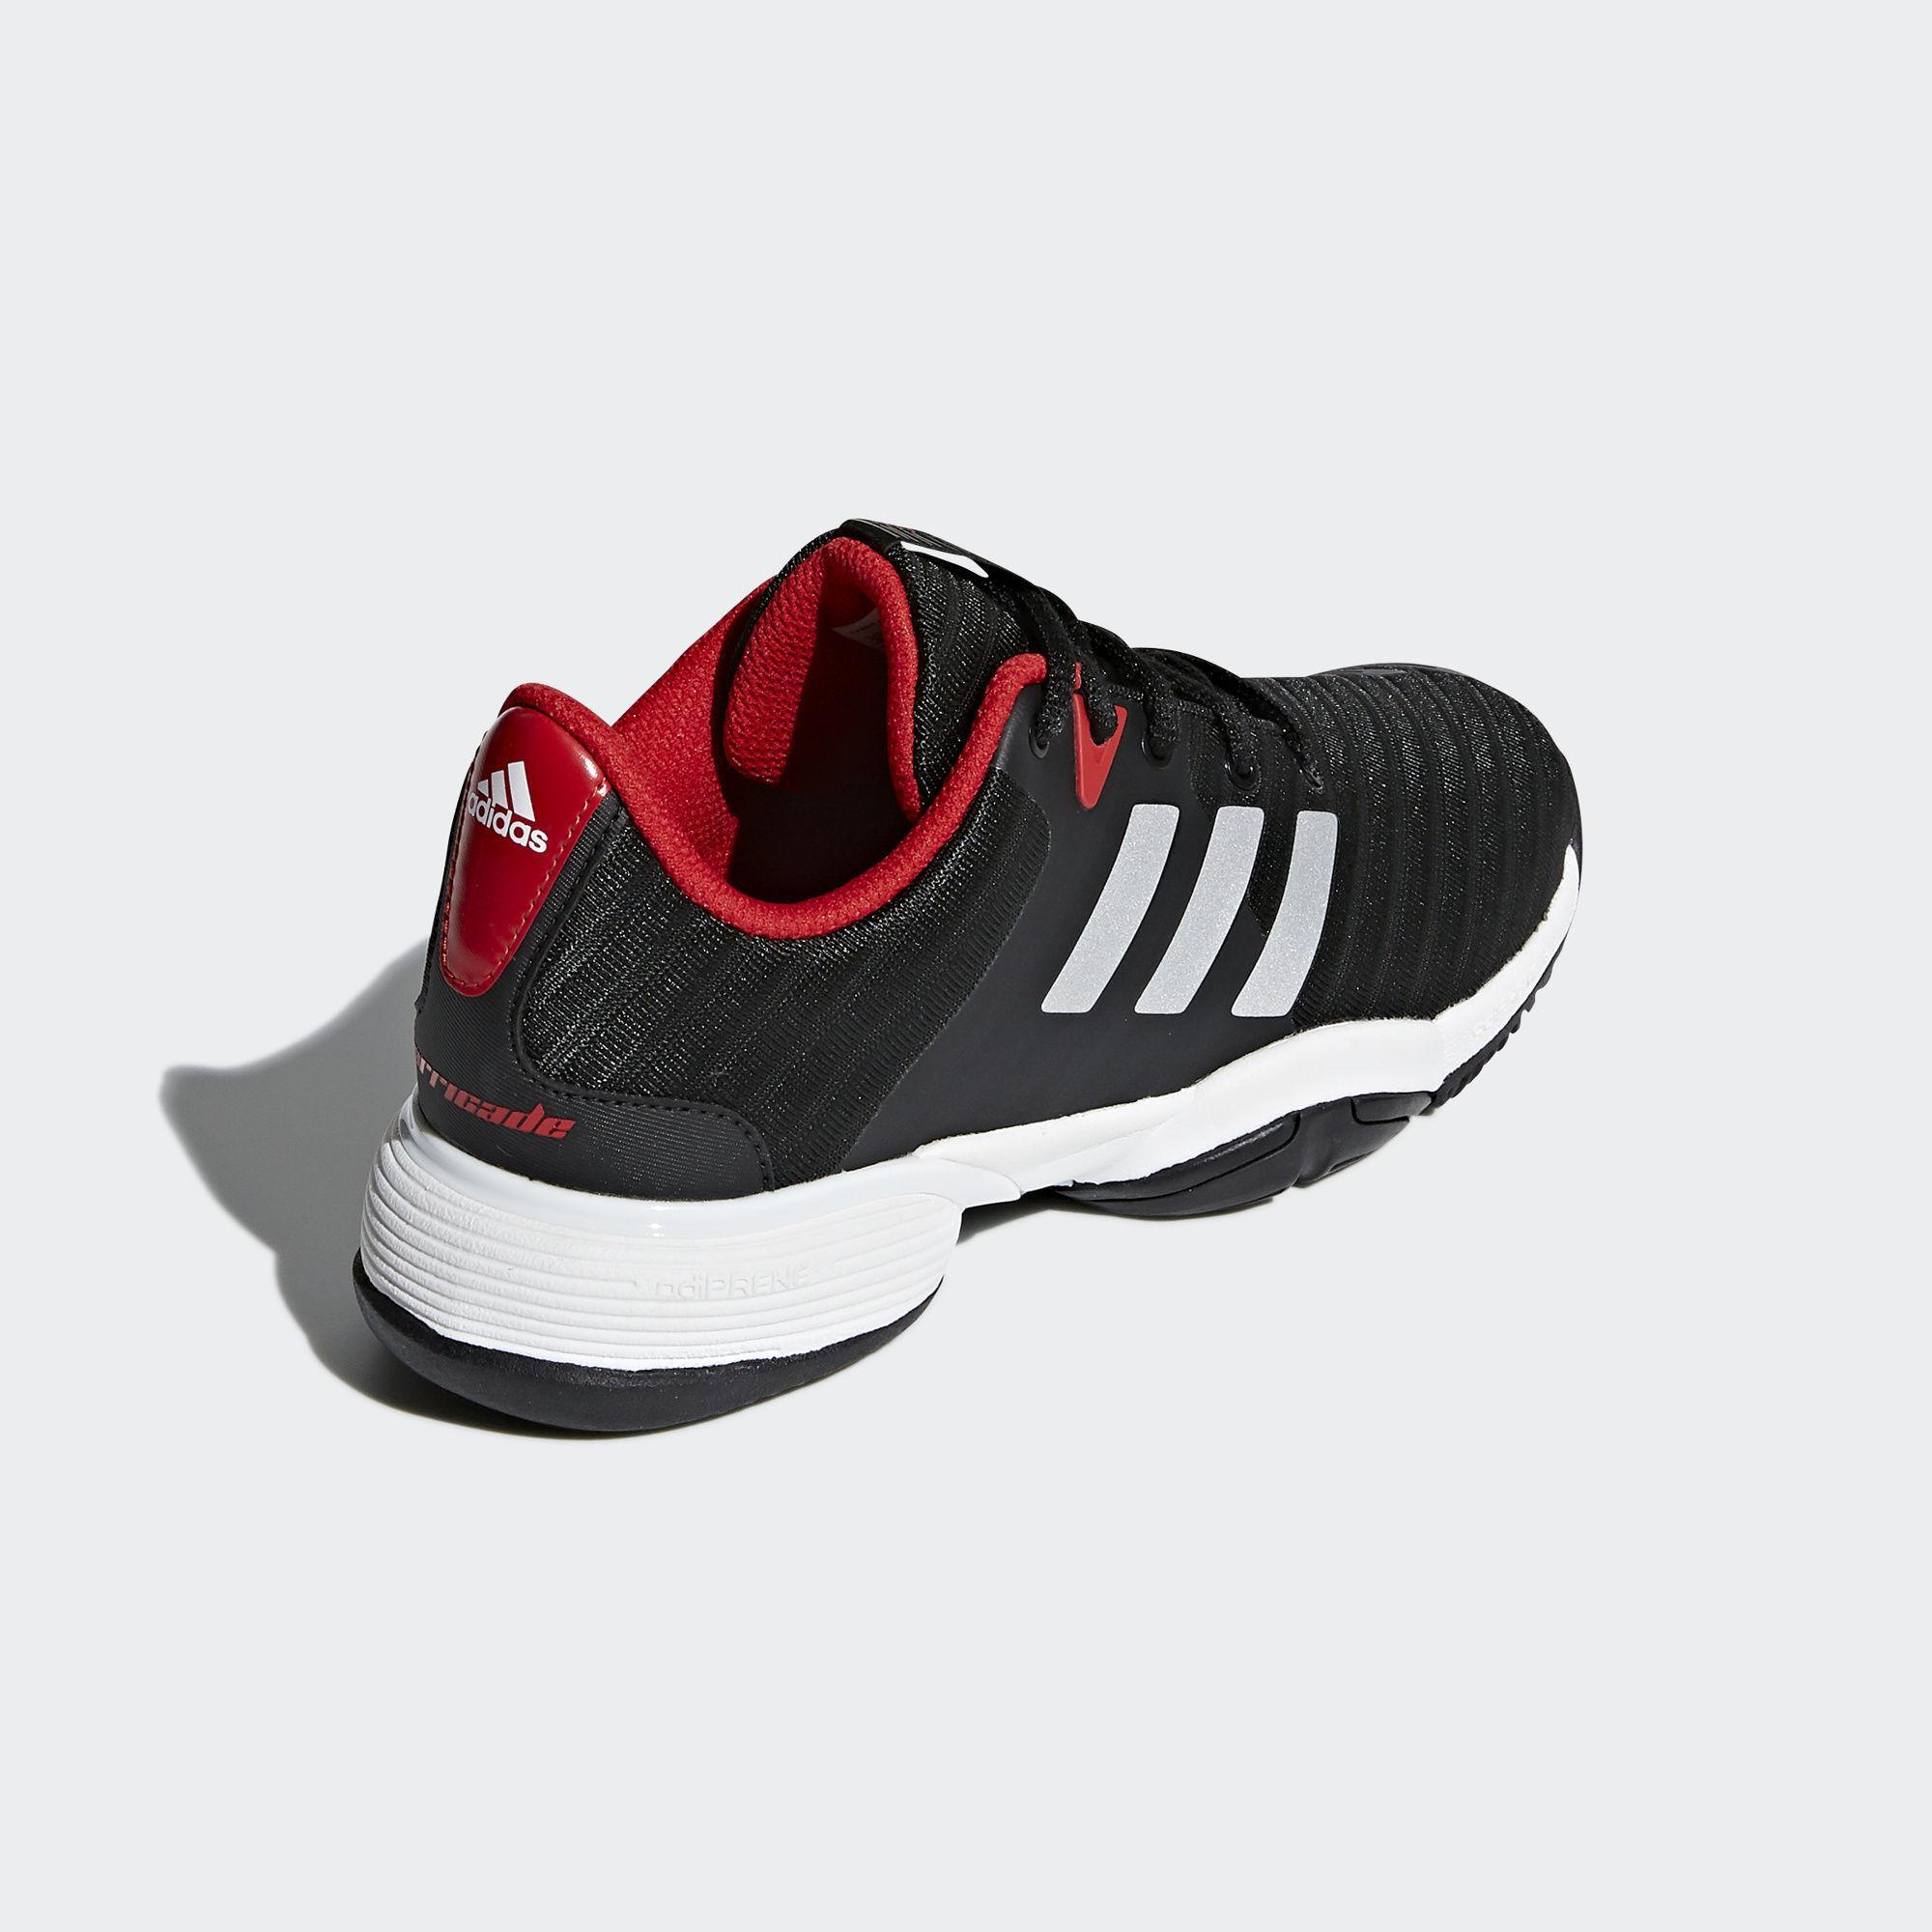 Adidas Kids Barricade 2018 Tennis Shoes - Black/White ...